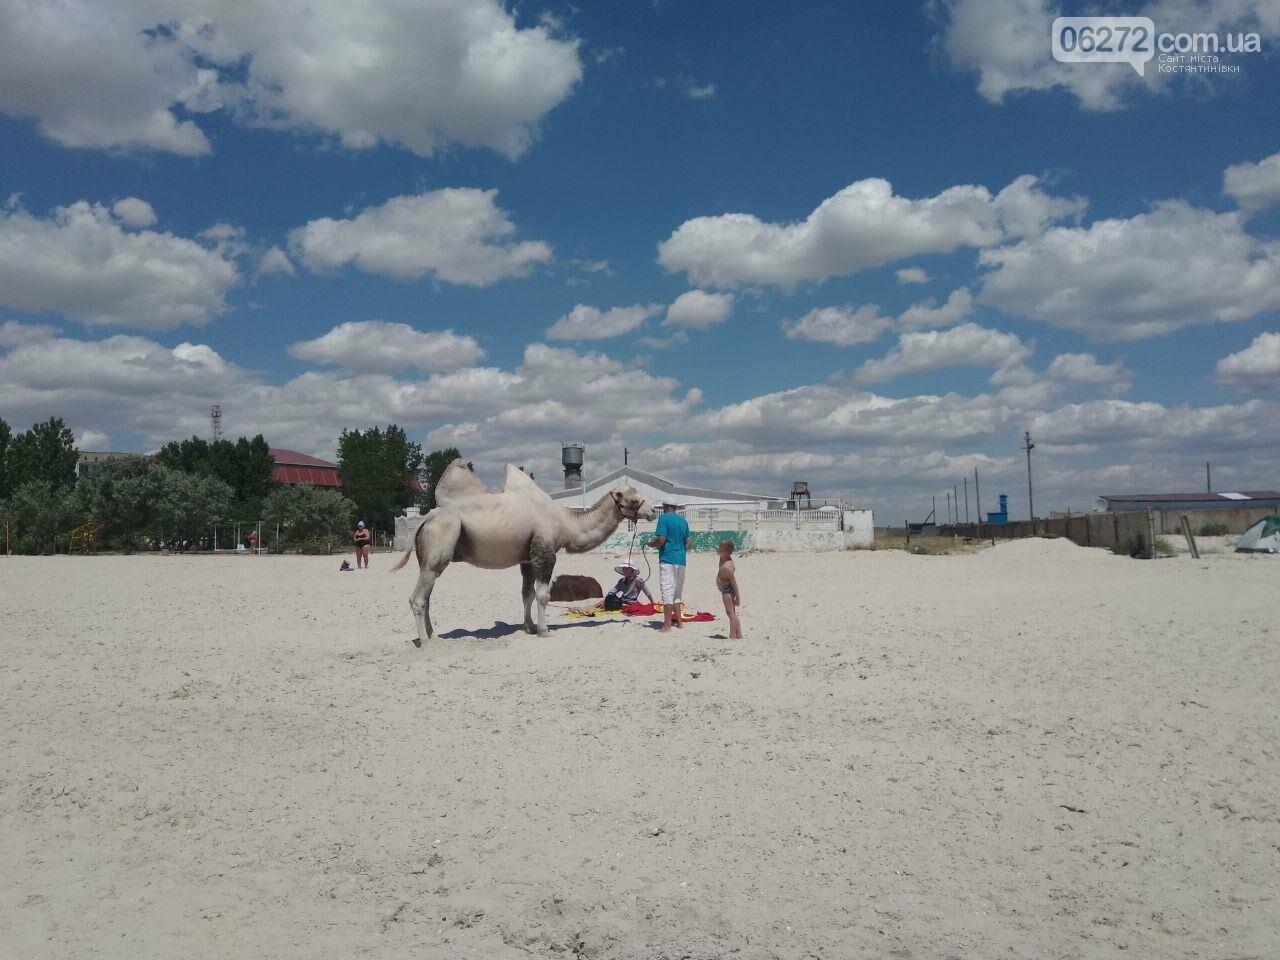 Автостопом по Украине: все пошло не по плану, фото-8